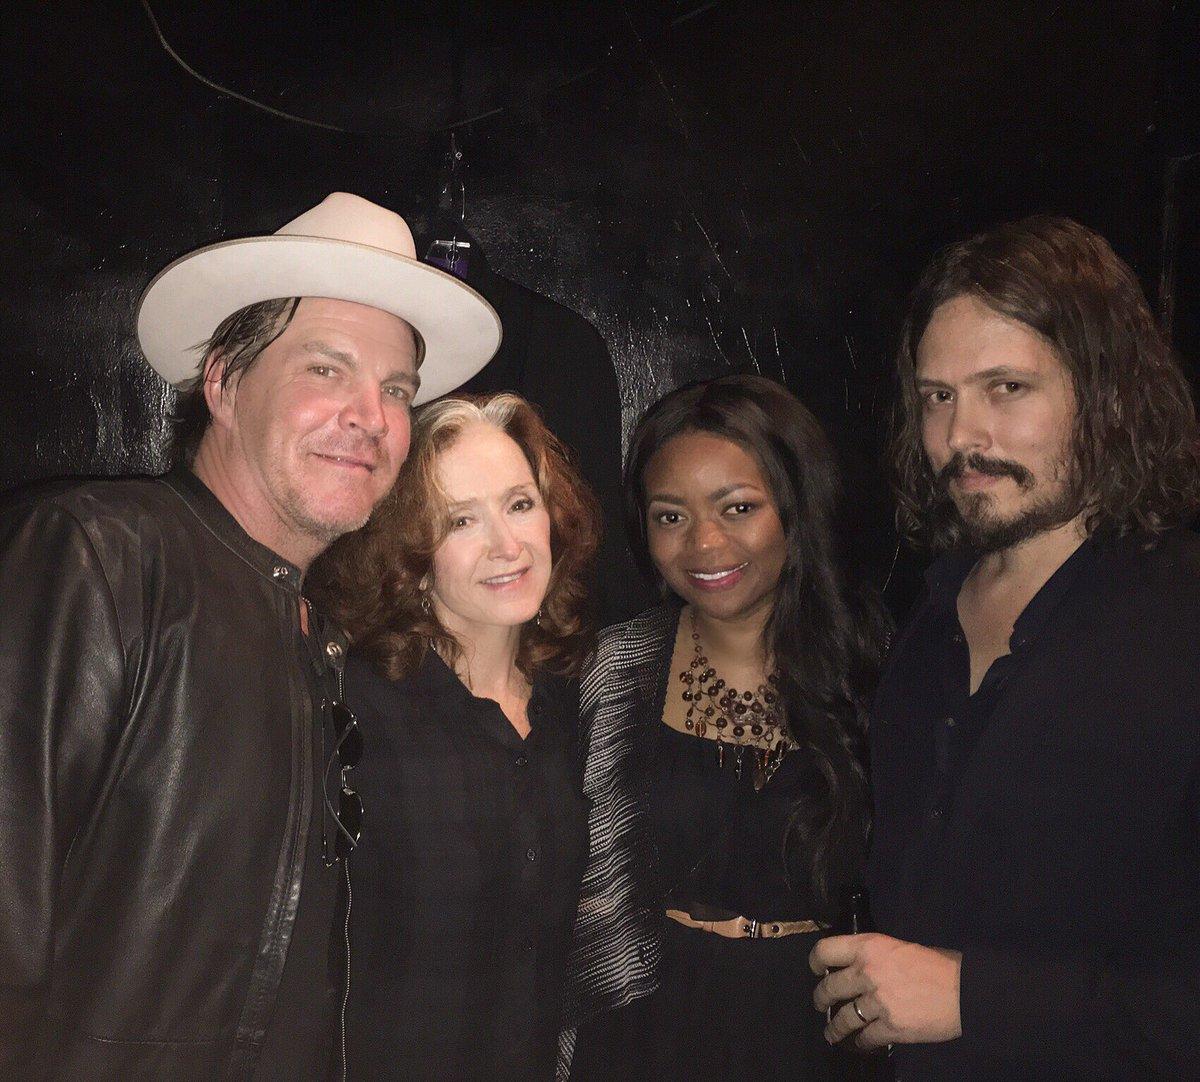 All the feels here w/ @JackIngram, @TheBonnieRaitt & John Paul White celebrating #GlennFrey at @theTroubadour ❤️ https://t.co/yMvU3RlRT8